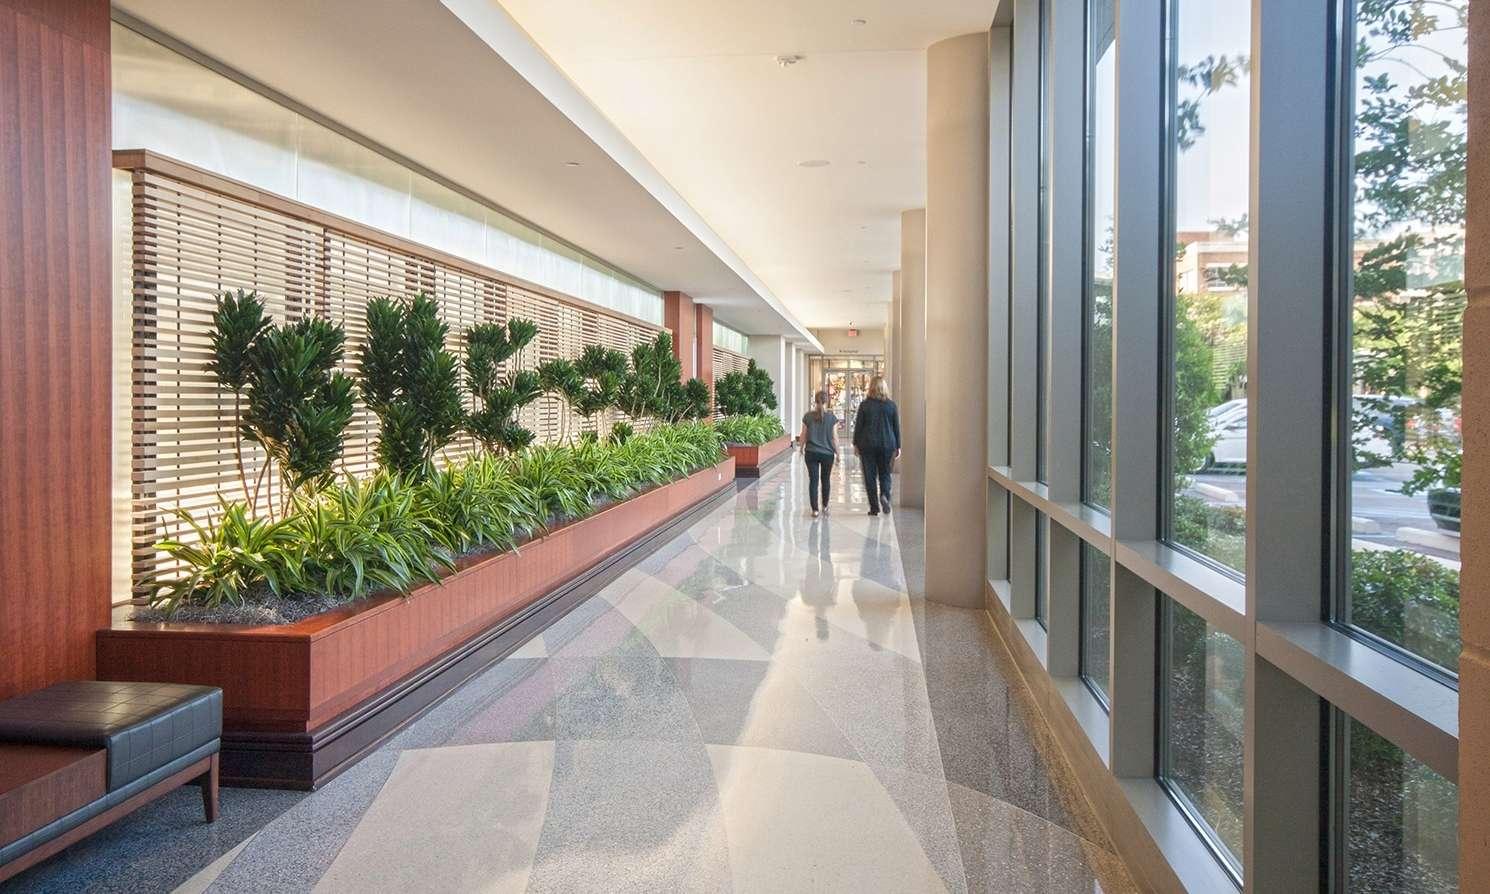 Baton Rouge General Medical Center Office Building Internal Colonnade